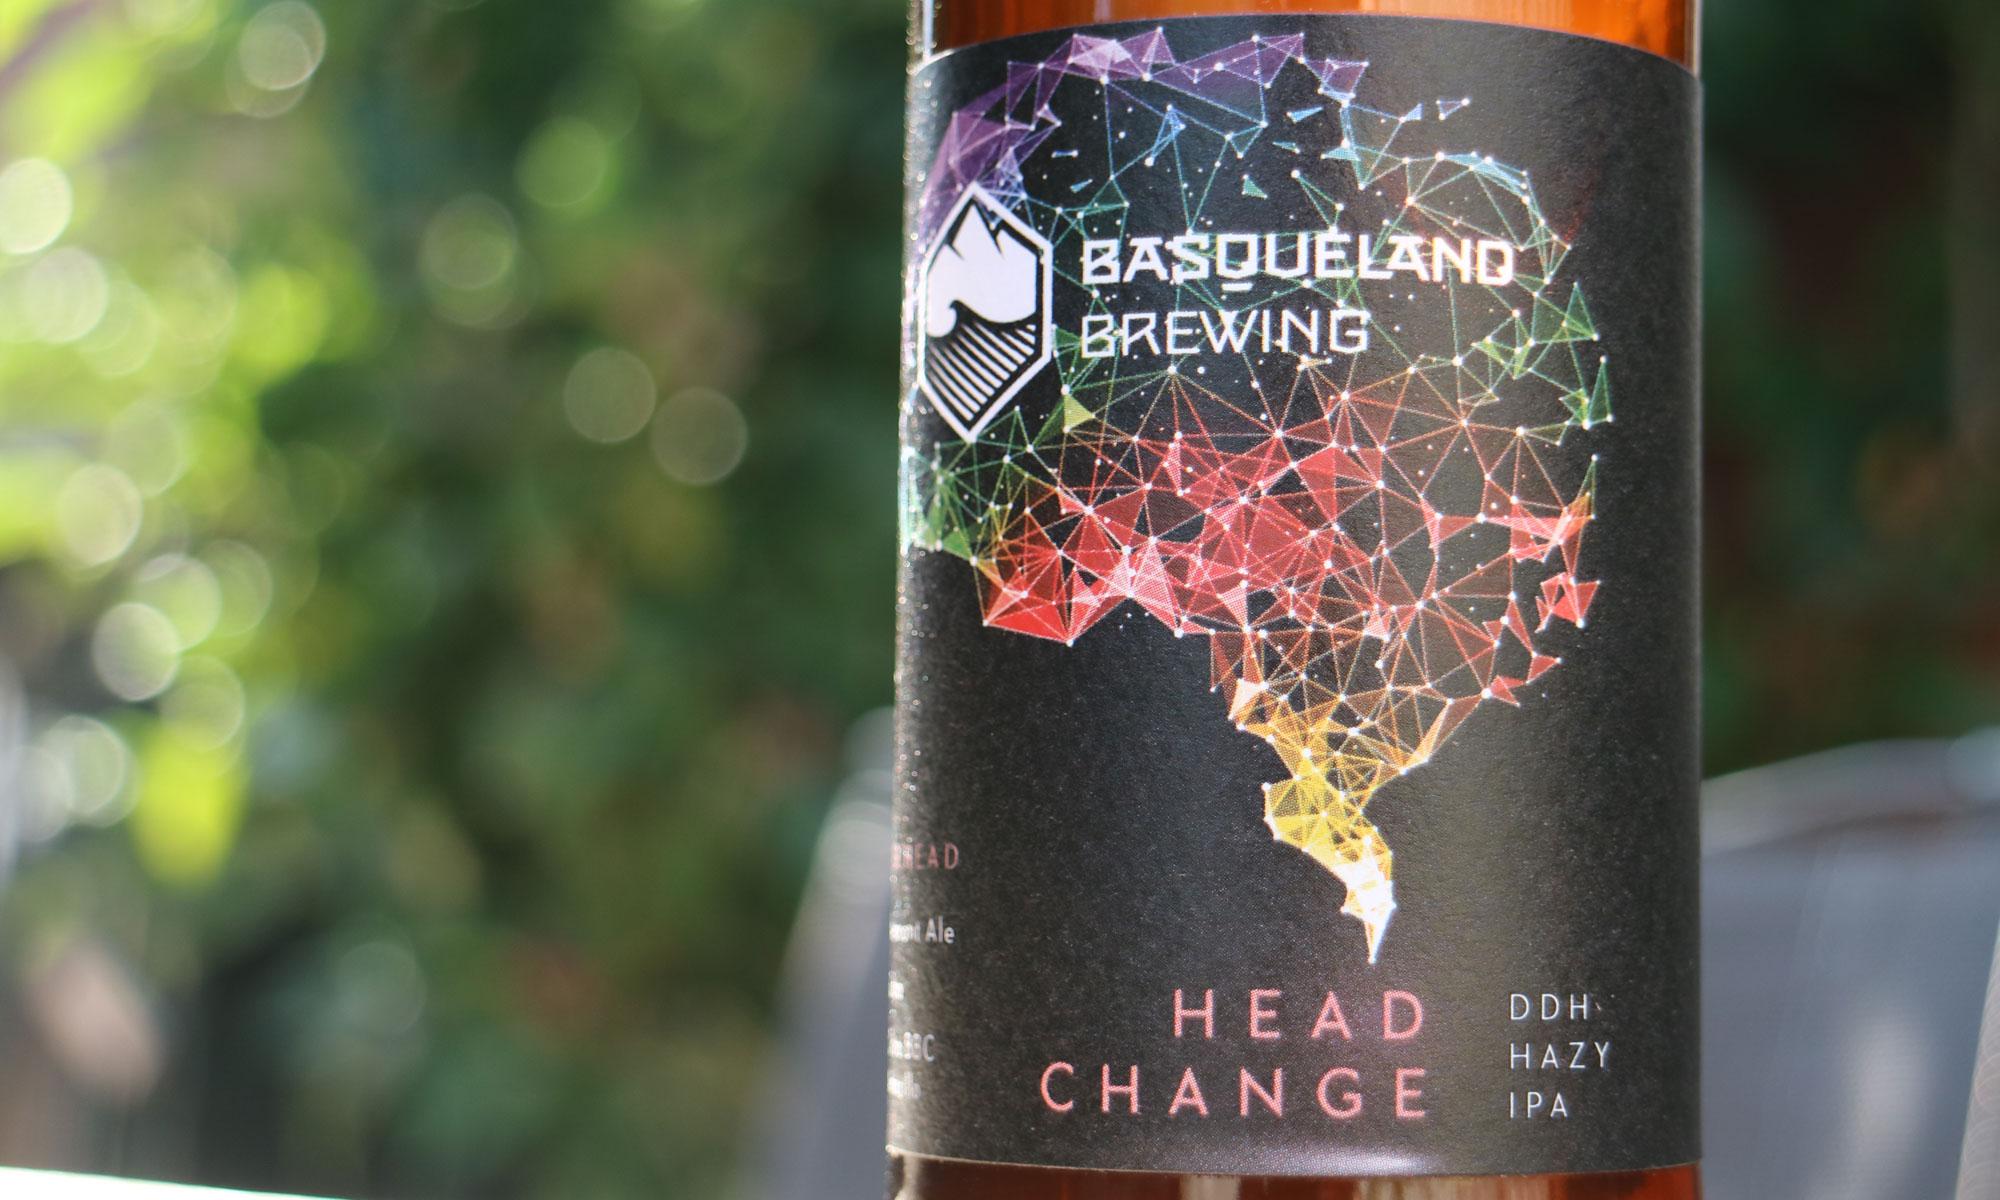 De Head Change van Basqueland brewing